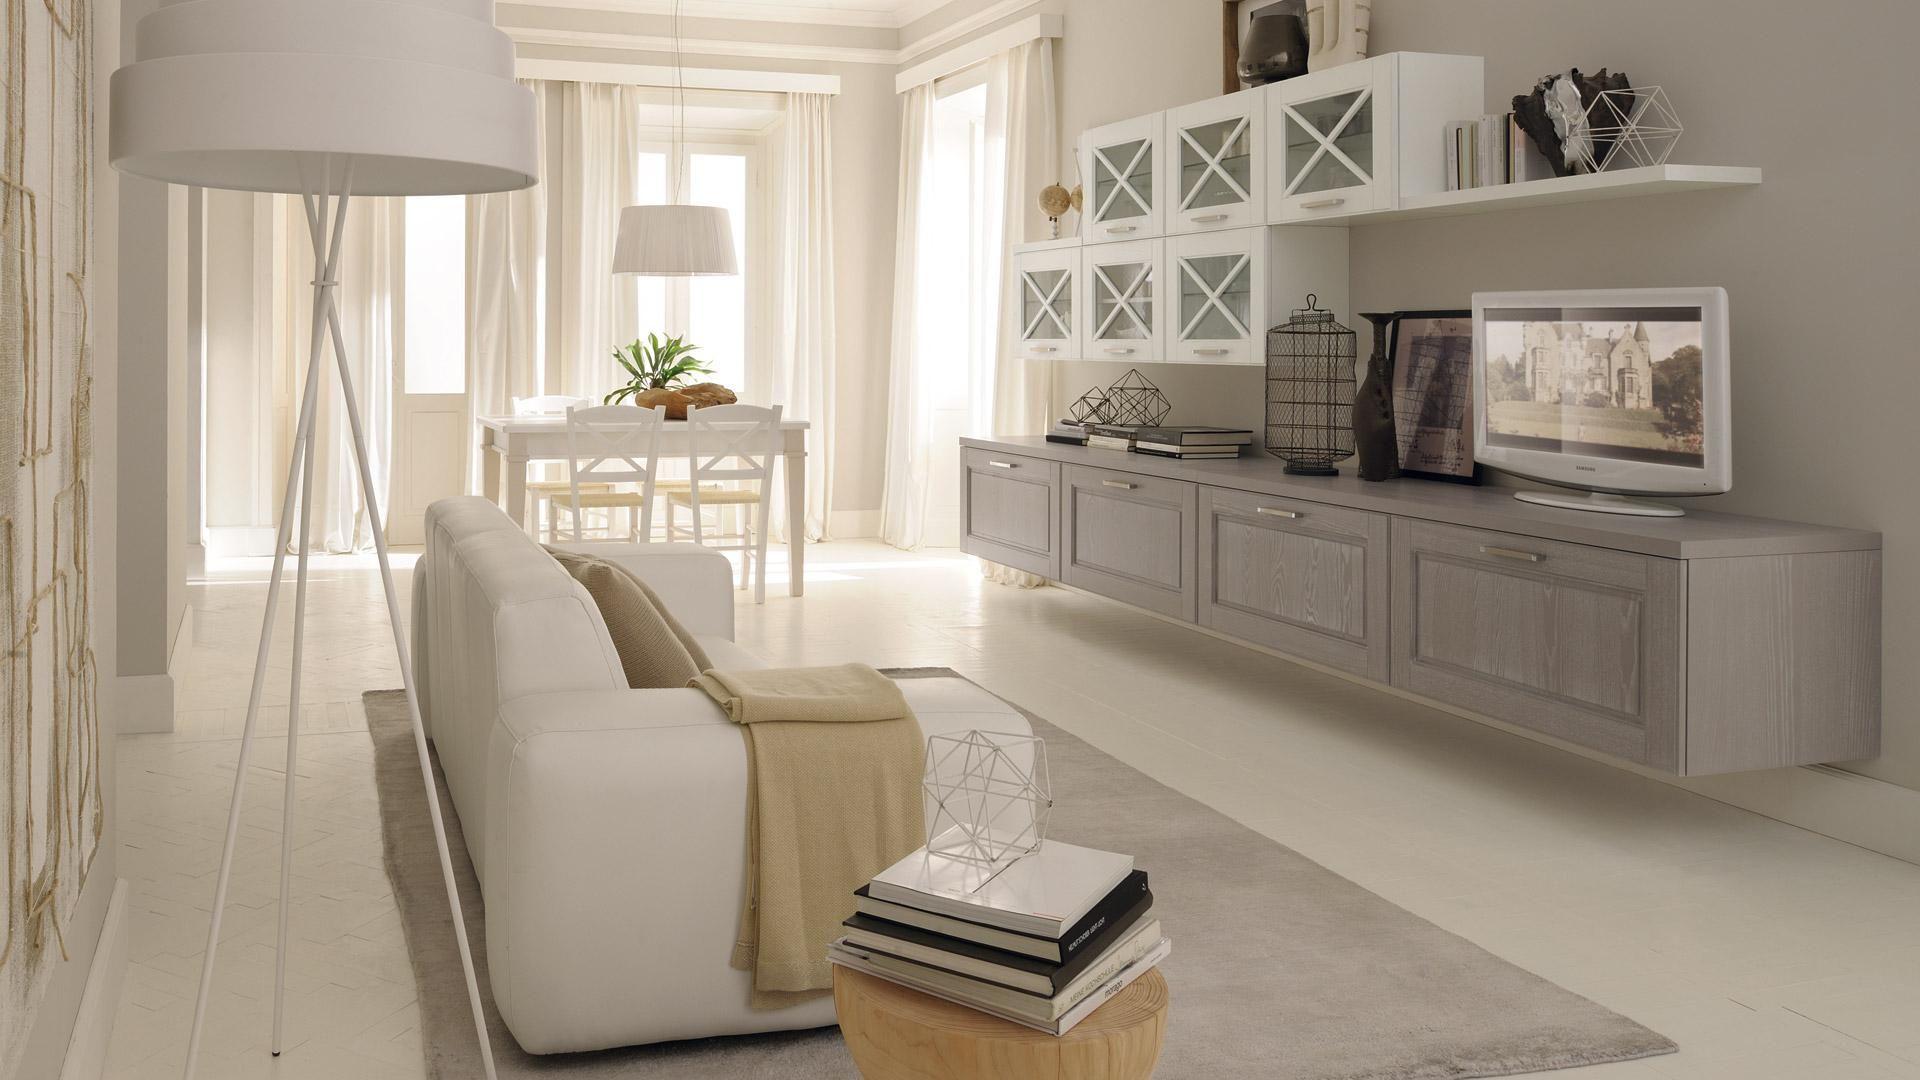 Agnese - Cucine Classiche - Cucine Lube | House | Pinterest ...